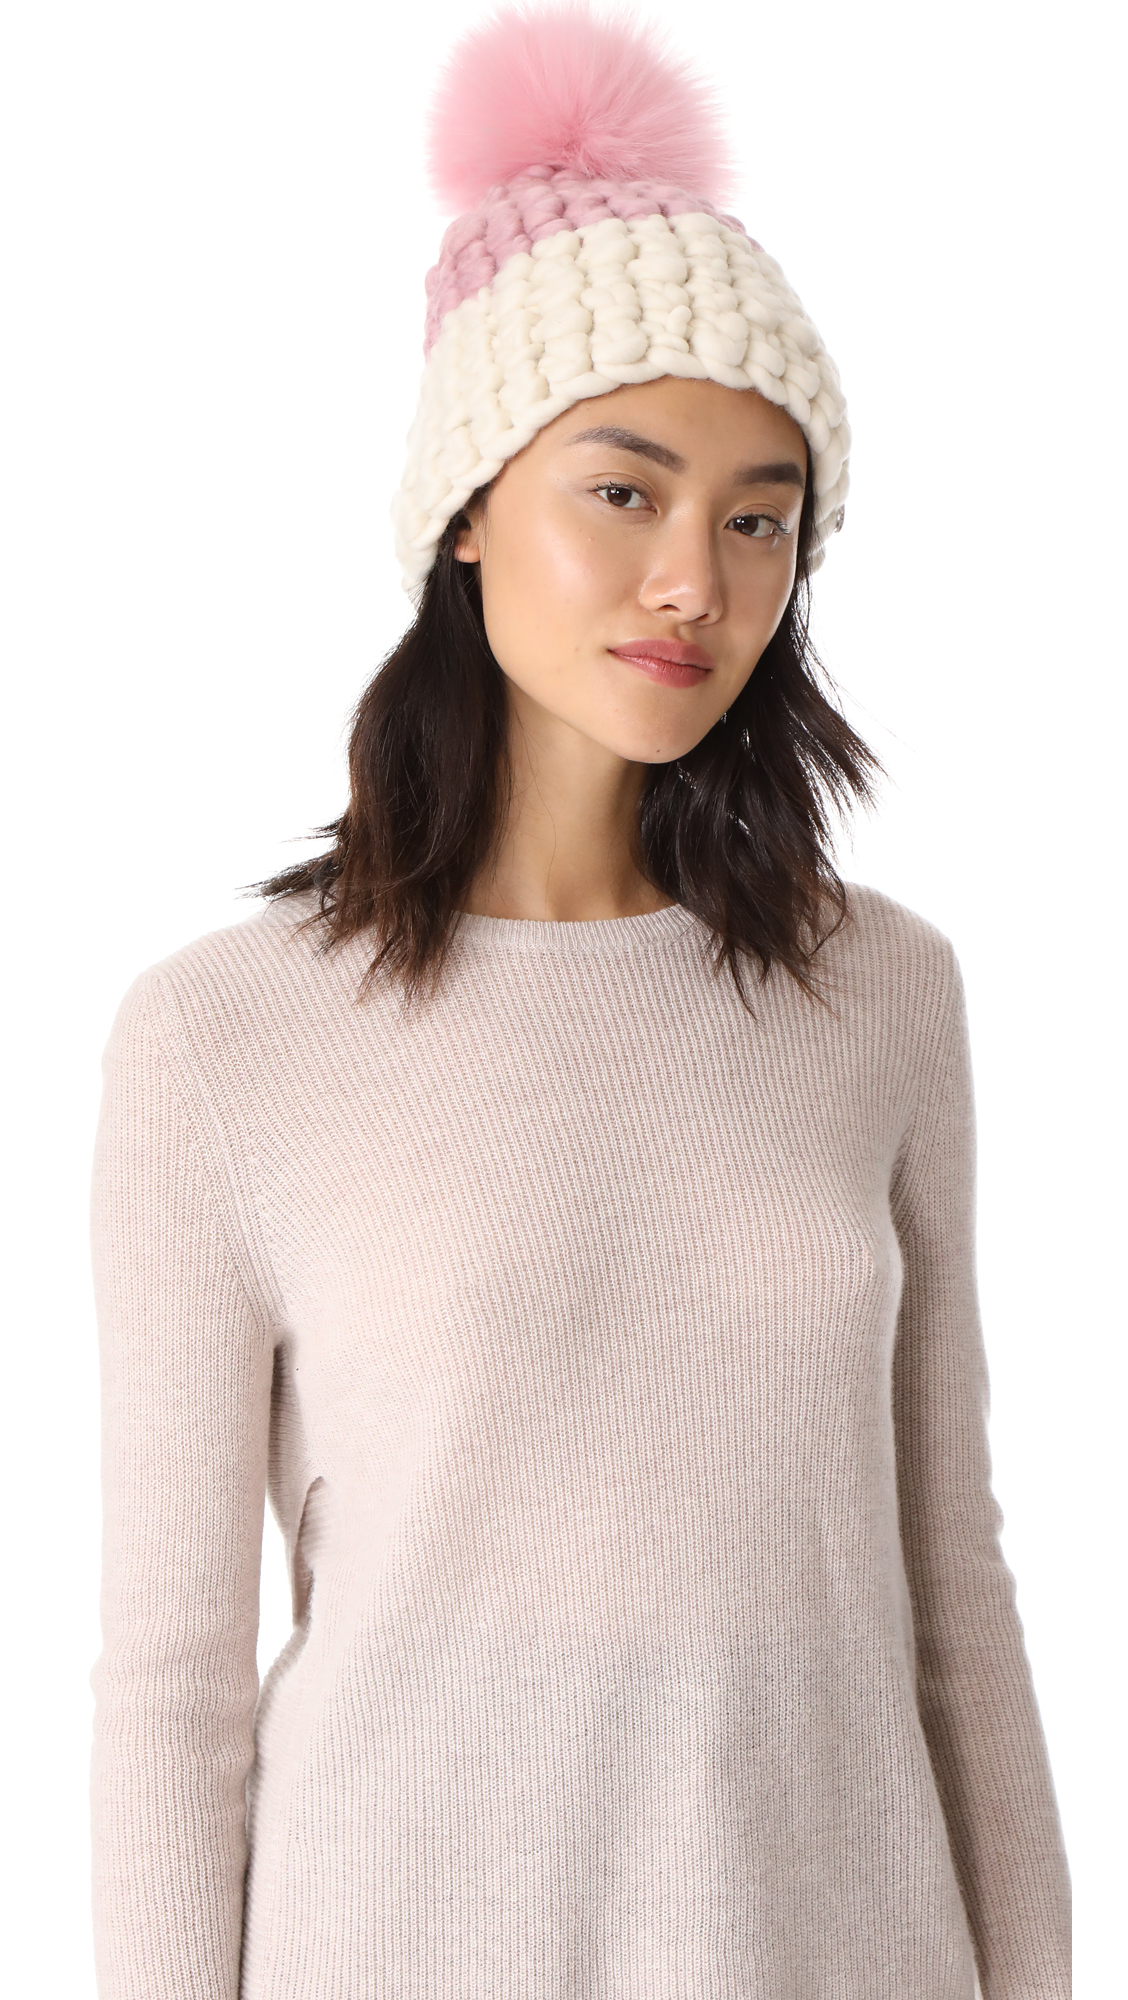 Mischa Lampert Deep Beanie Colorblock Hat - Dusty Rose/White/Pink